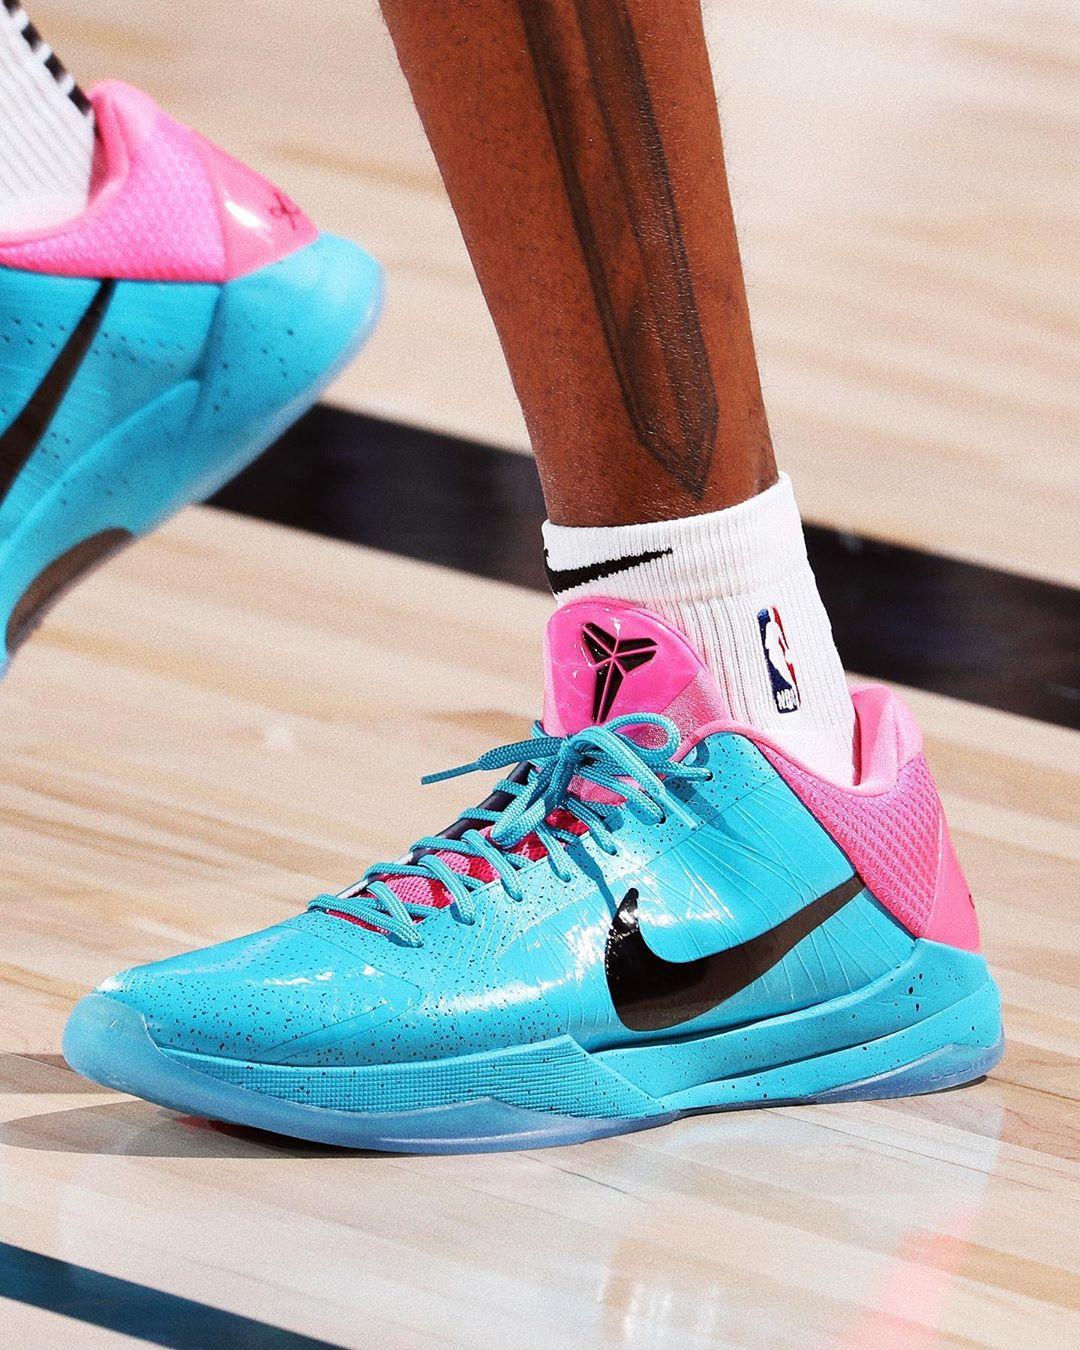 Nike,Kobe 5 Protro,Miami Vice,  太帅了!南海岸 ZK5 首度曝光!上脚的居然是...